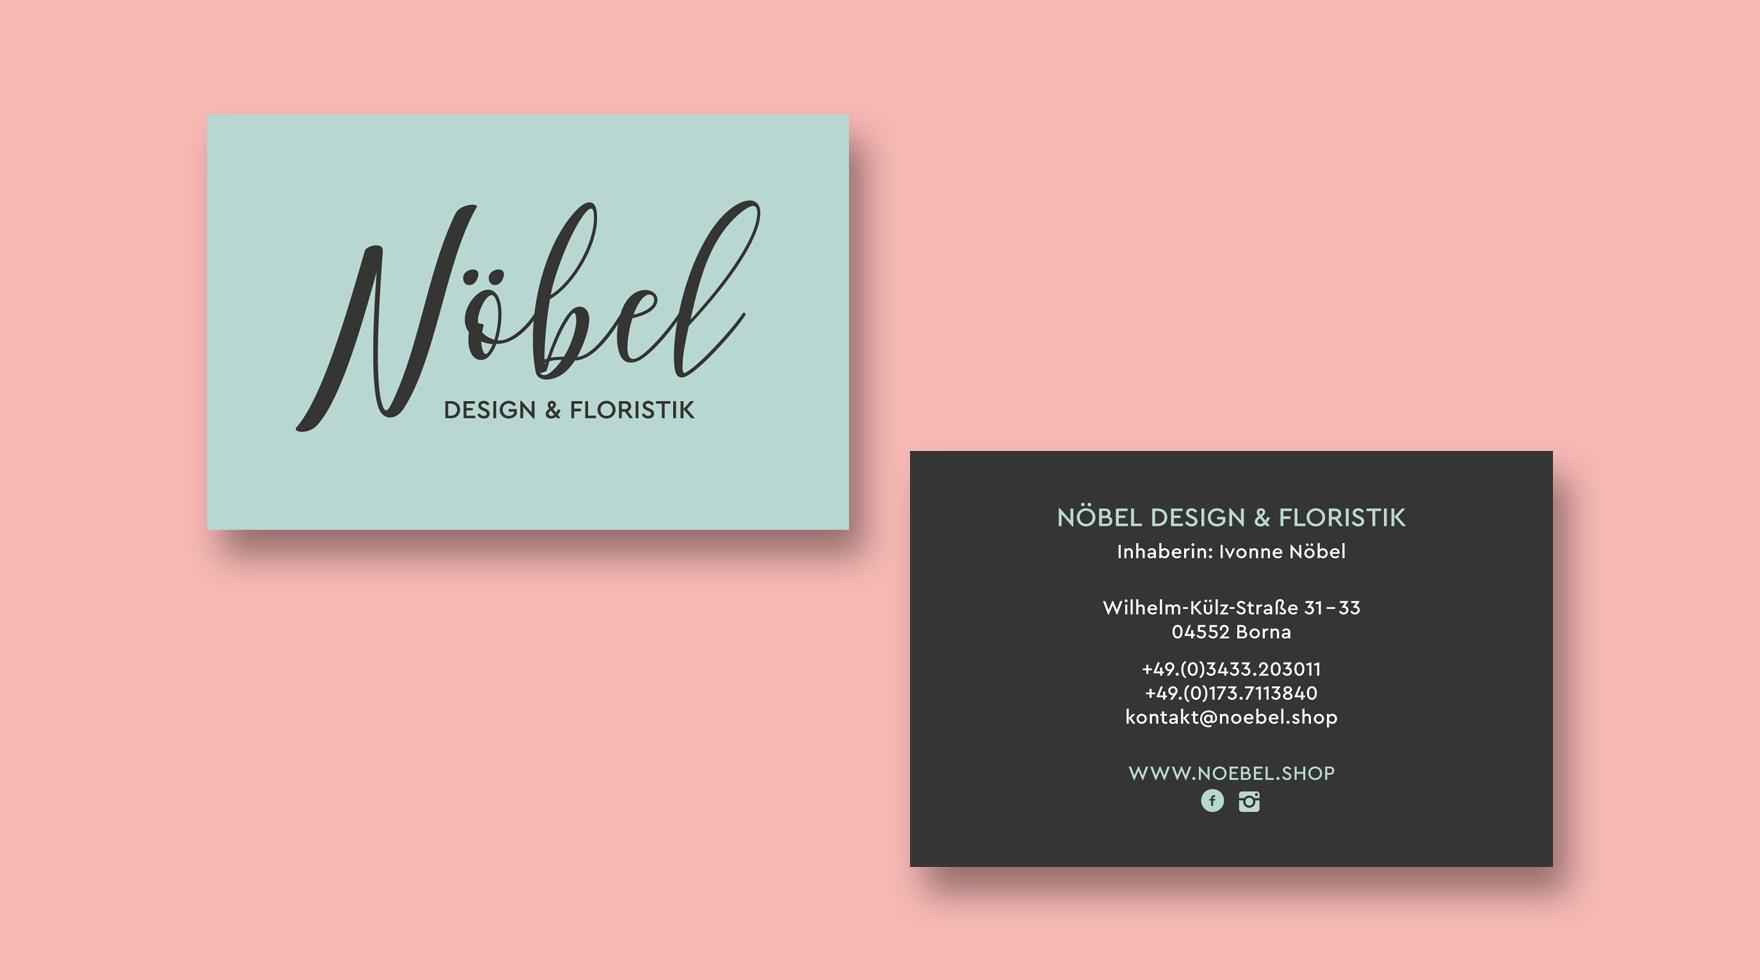 businesscard-design-noebel-leipzig-agency